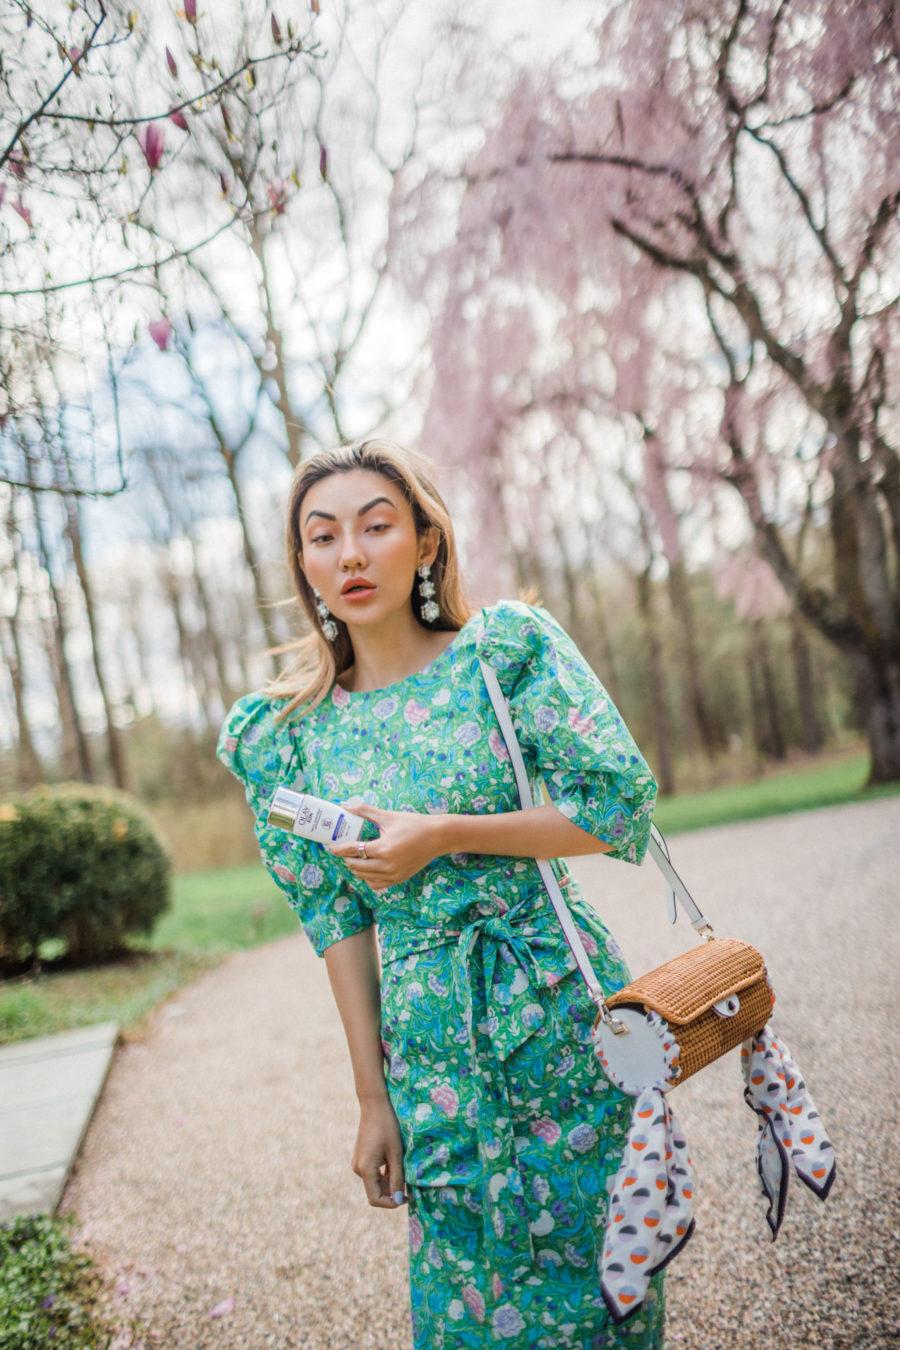 Olay Sun Face Sunscreen, Olay Sun Face Sunscreen review, puff sleeve dress, straw bag // Notjessfashion.com